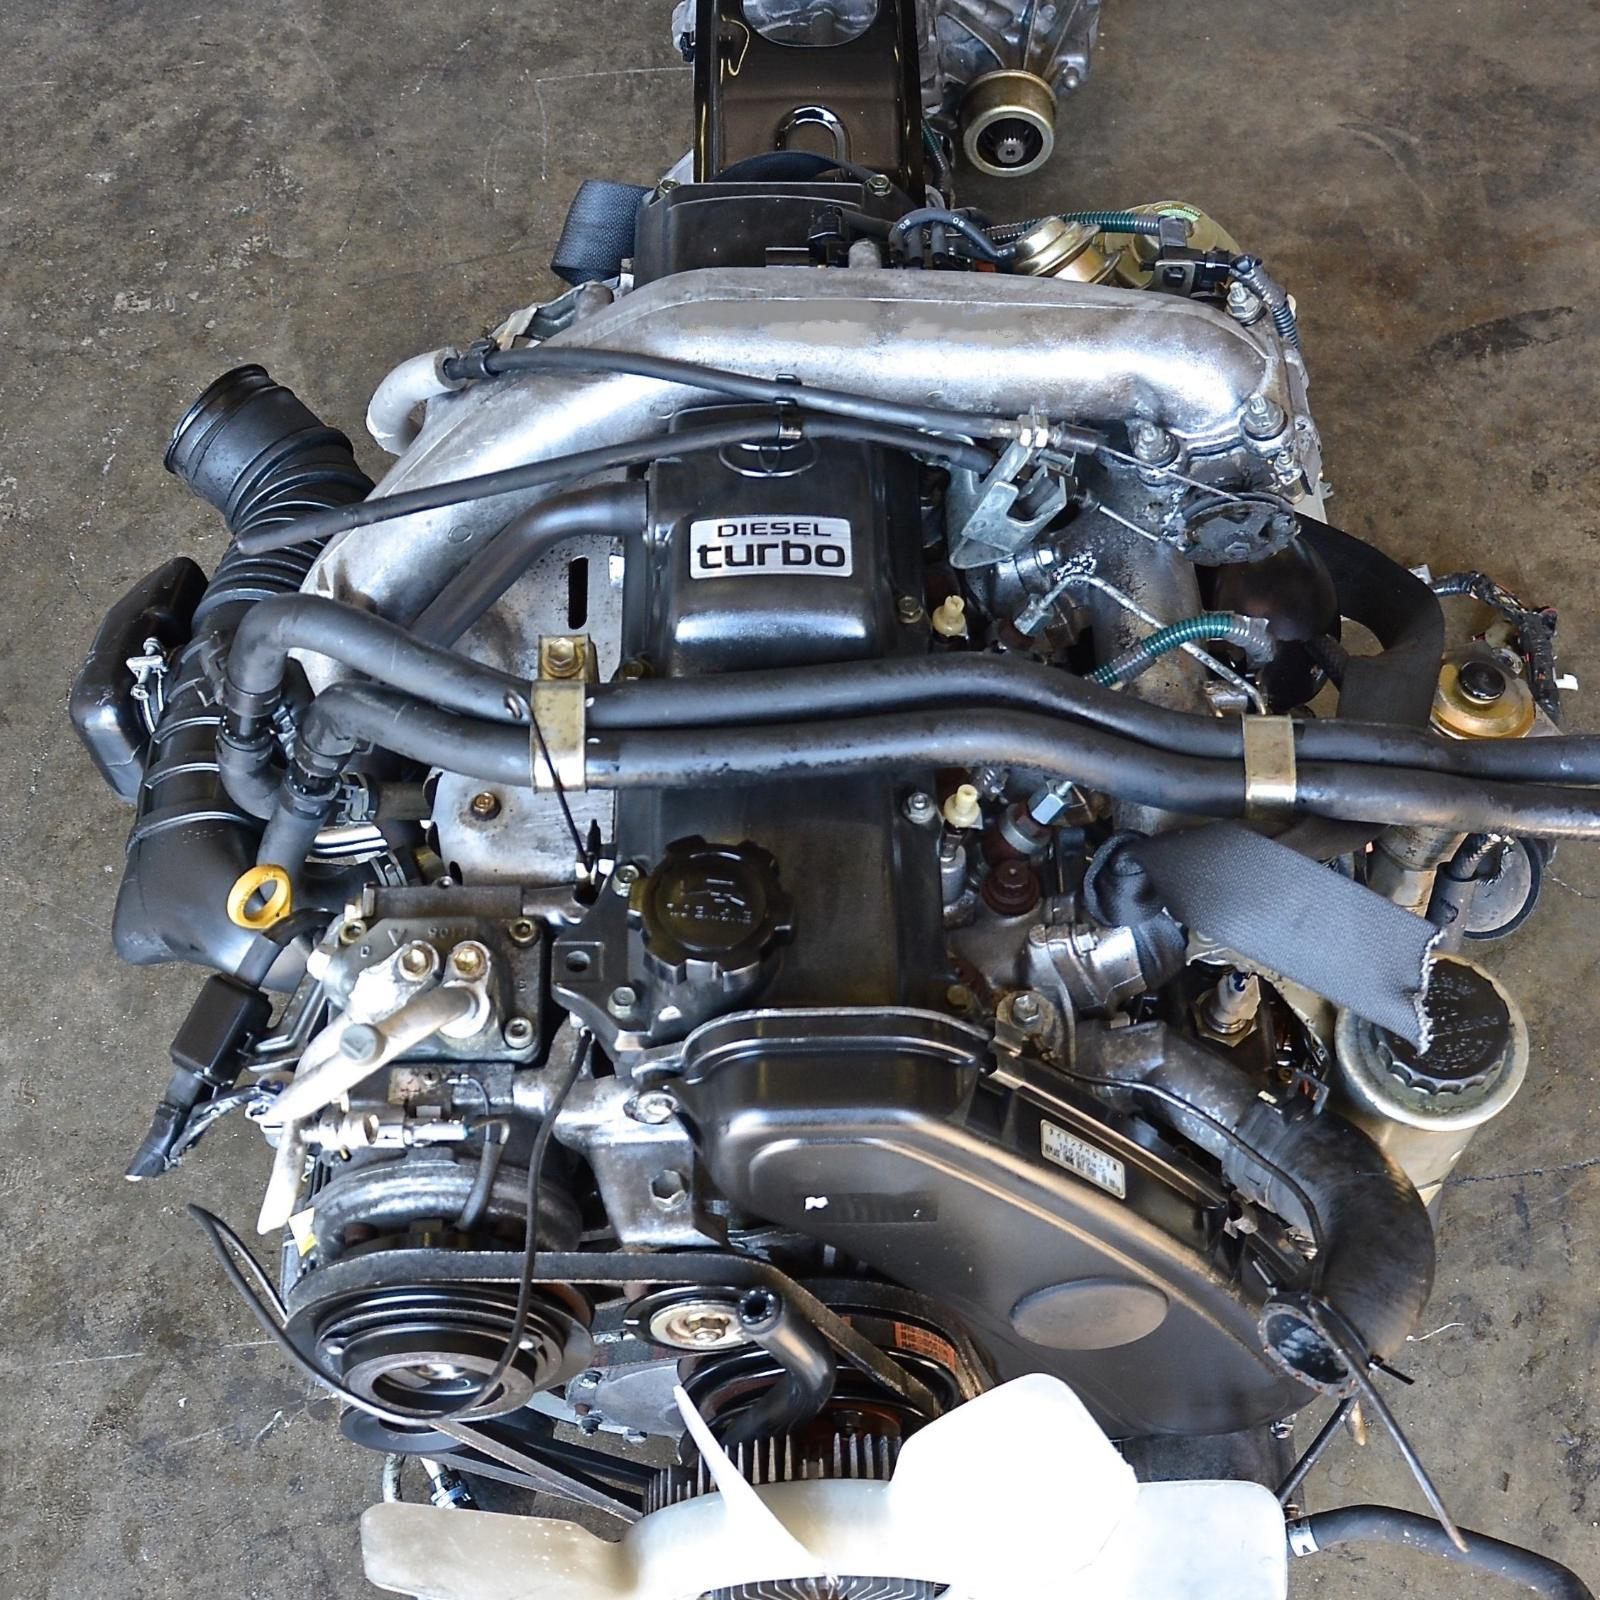 TOYOTA HILUX, Engine, DIESEL, 3.0, 1KZ-TE, TURBO, 4WD, 09/97-03/05